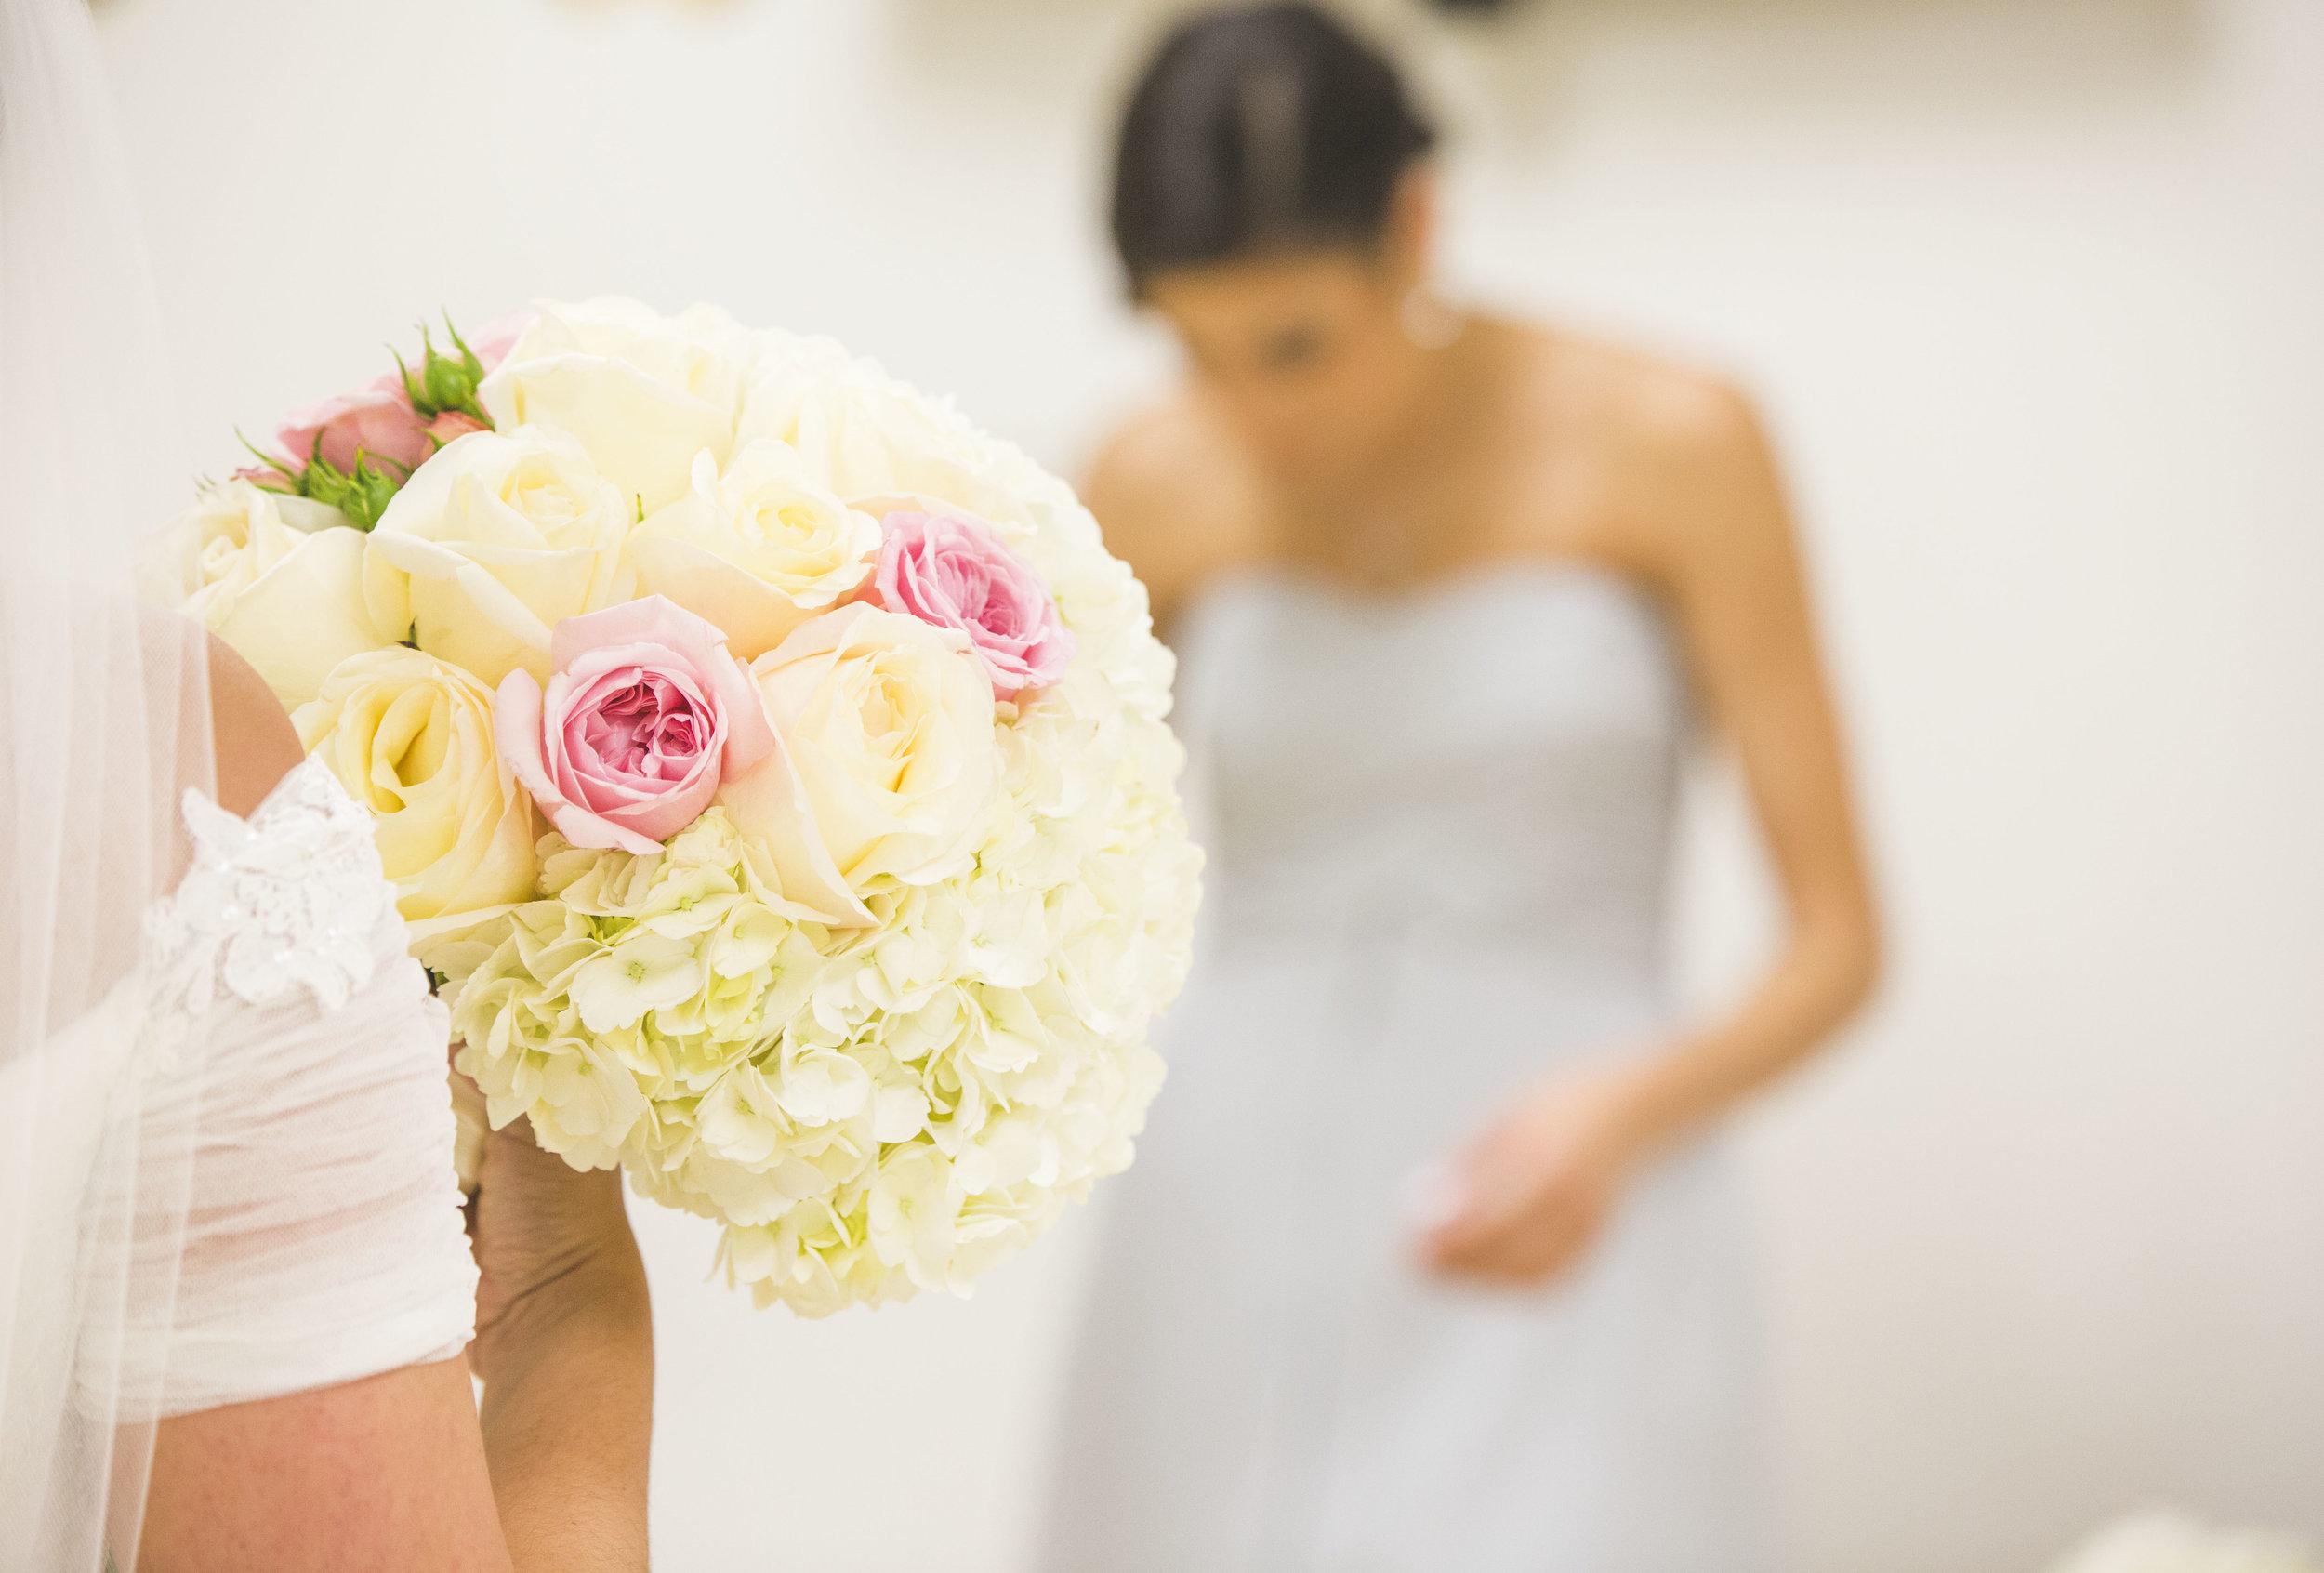 ATGI_Magali & Josh Wedding_2S8A0396.jpg